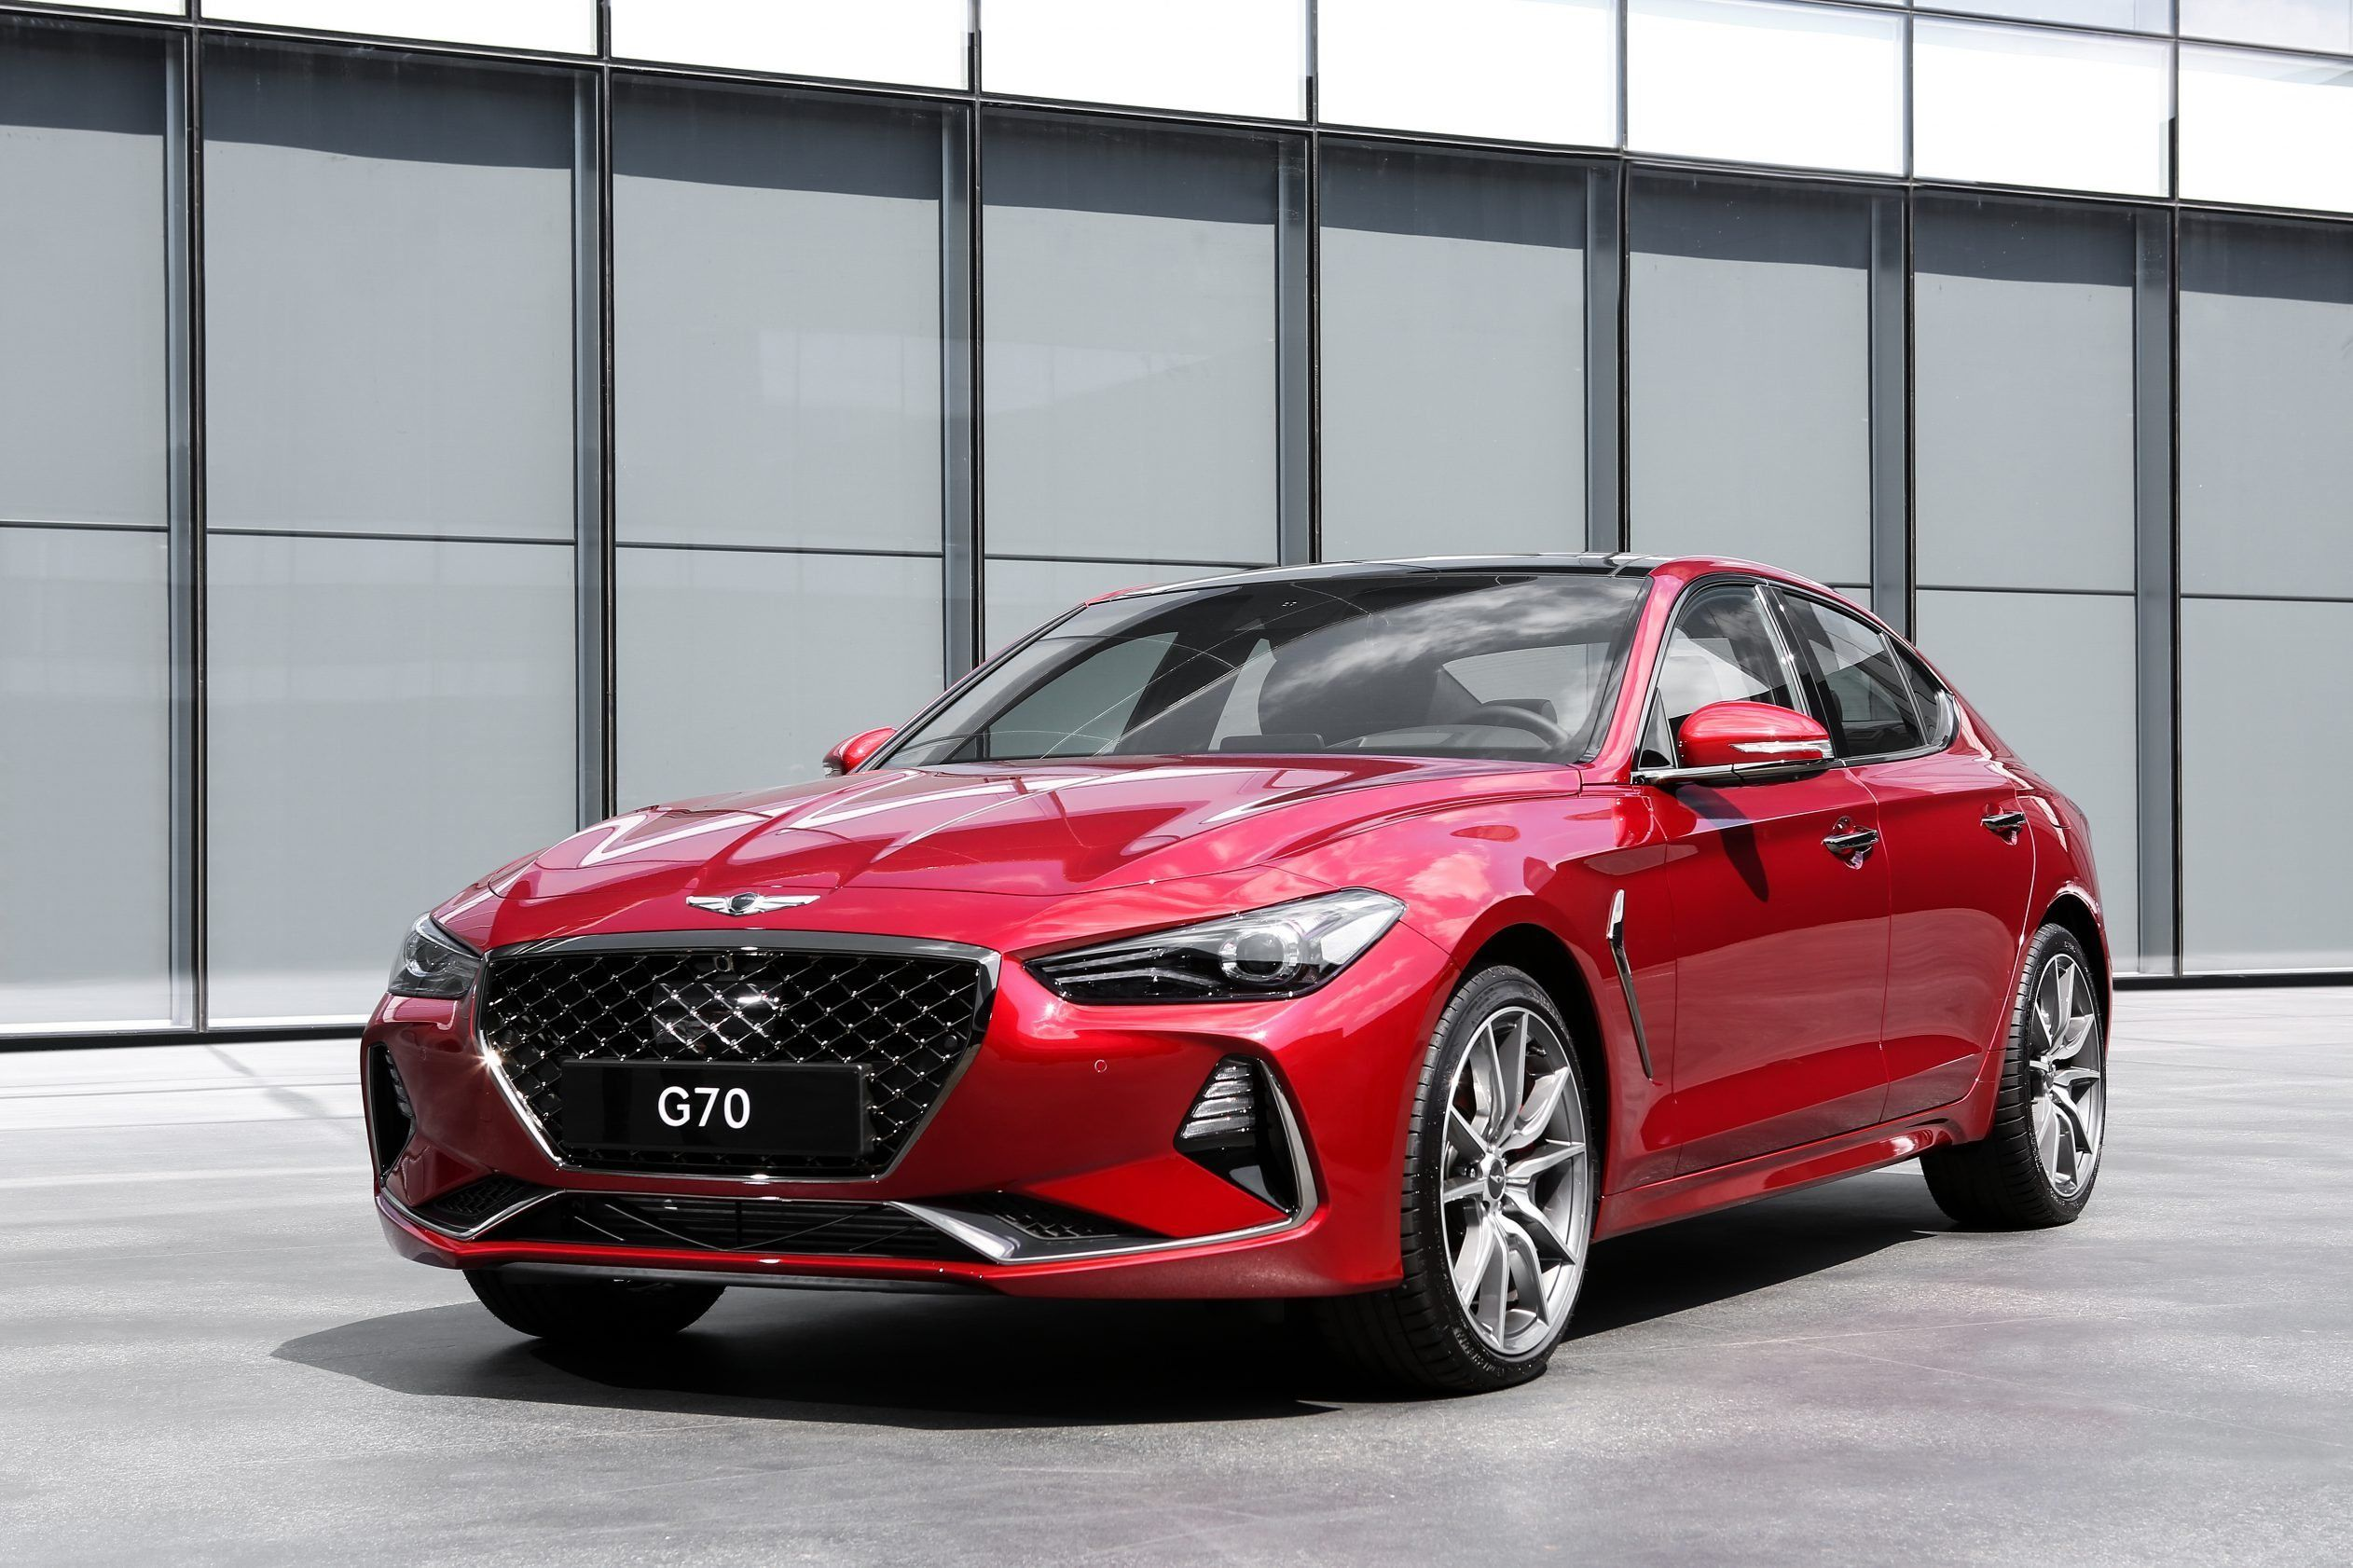 2021 Hyundai Tucson Spy Shoot In 2020 Hyundai New Cars Lexus